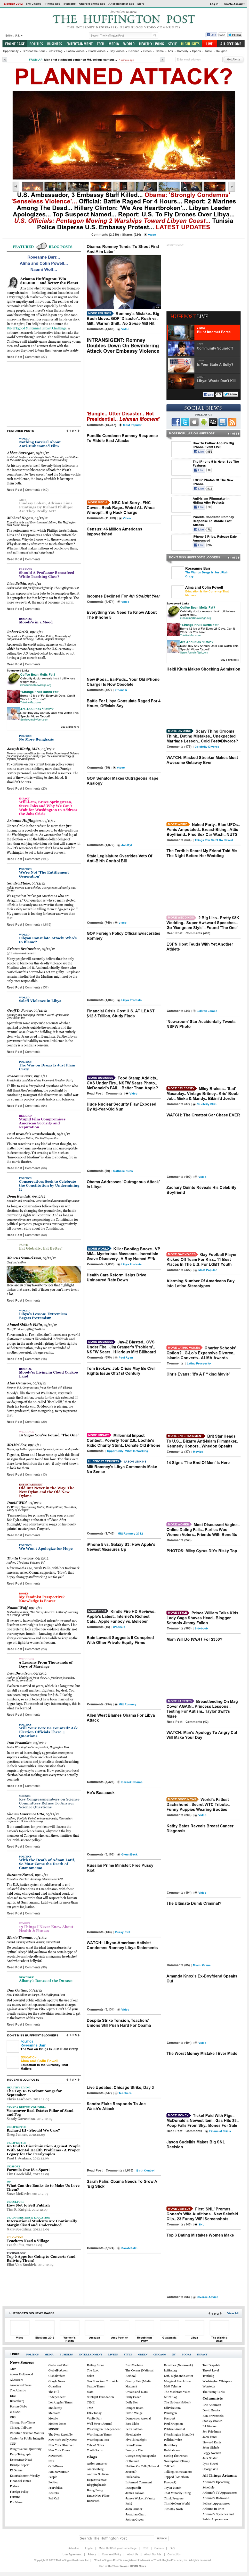 The Huffington Post at Wednesday Sept. 12, 2012, 11:13 p.m. UTC